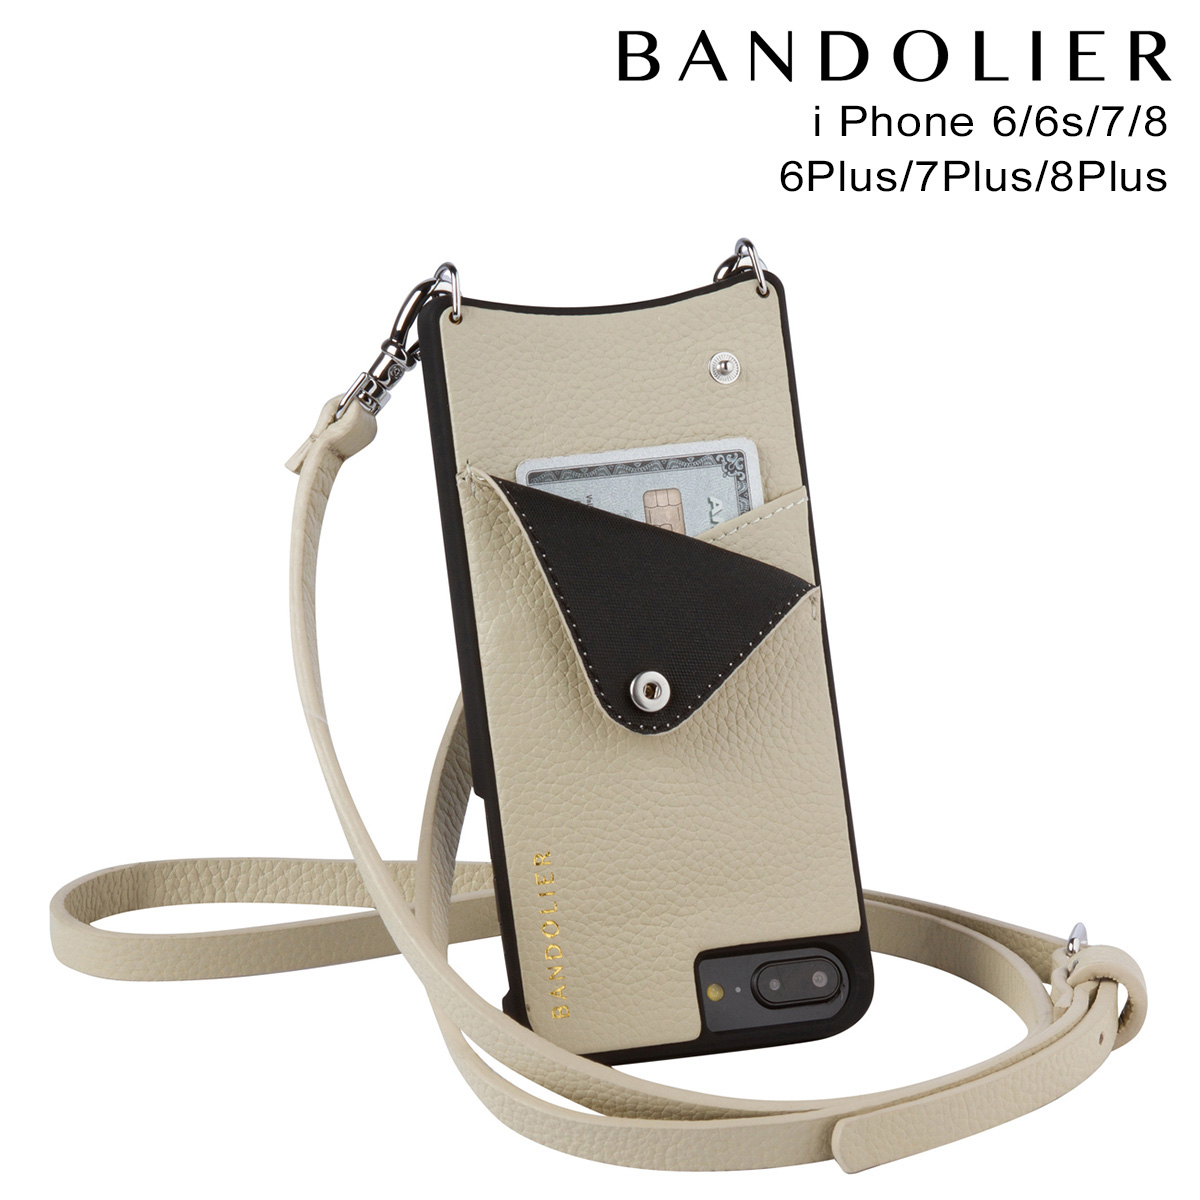 BANDOLIER EMMA IVORY バンドリヤー iPhone8 iPhone7 7Plus 6s ケース スマホ アイフォン プラス メンズ レディース